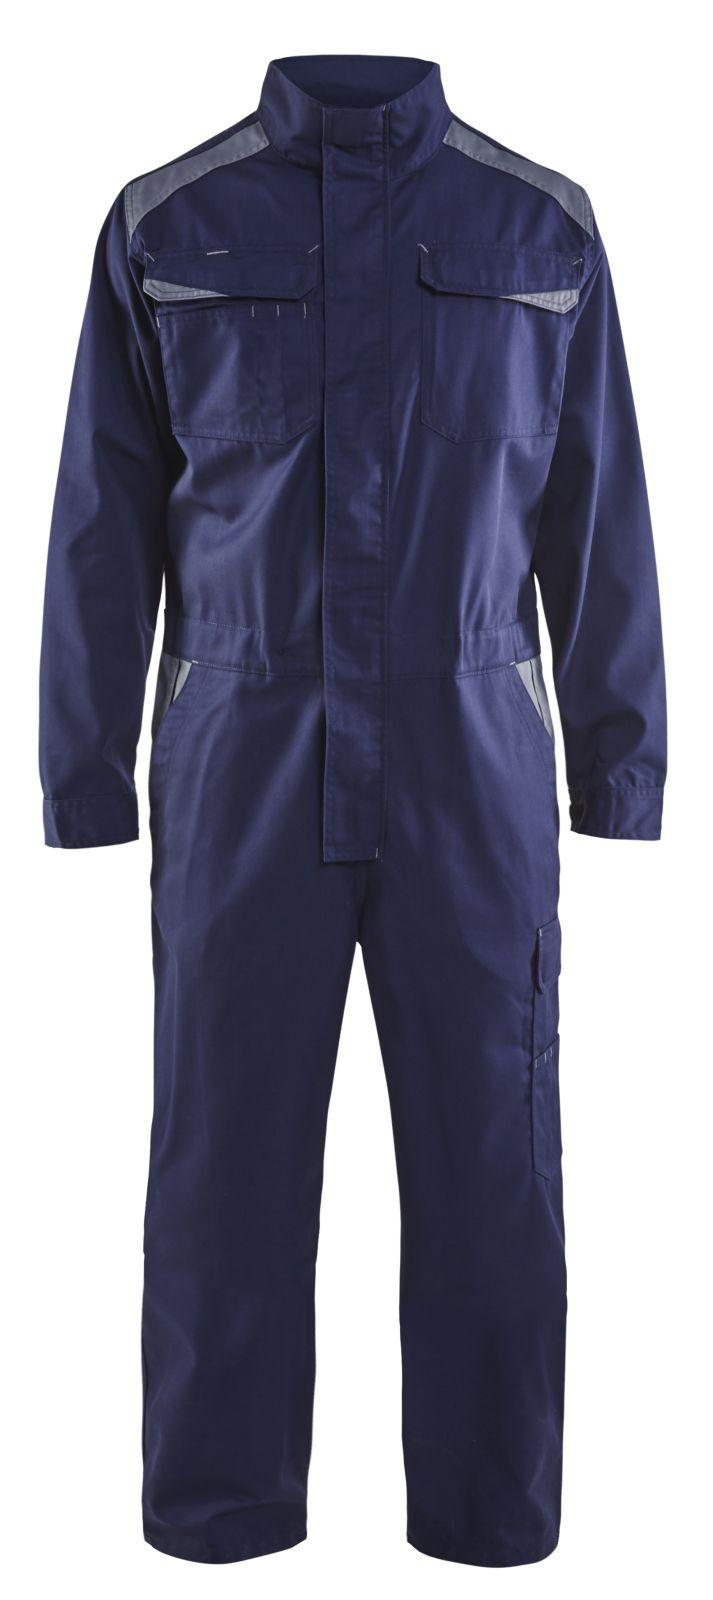 Blaklader Overalls 60541800 marineblauw-grijs(8994)